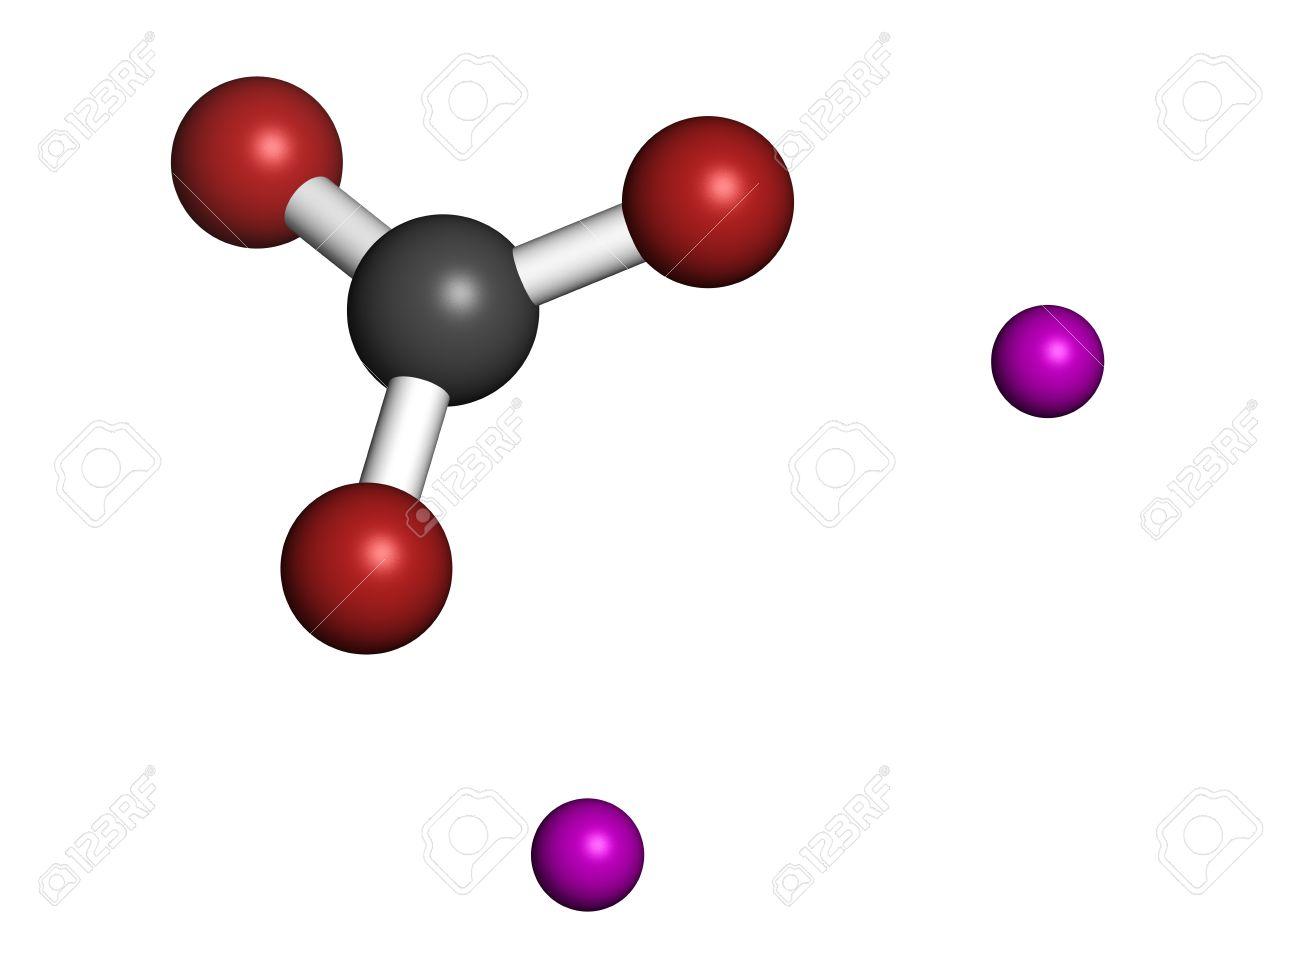 Lithium carbonate (Li2CO3) bipolar disorder drug, chemical structure